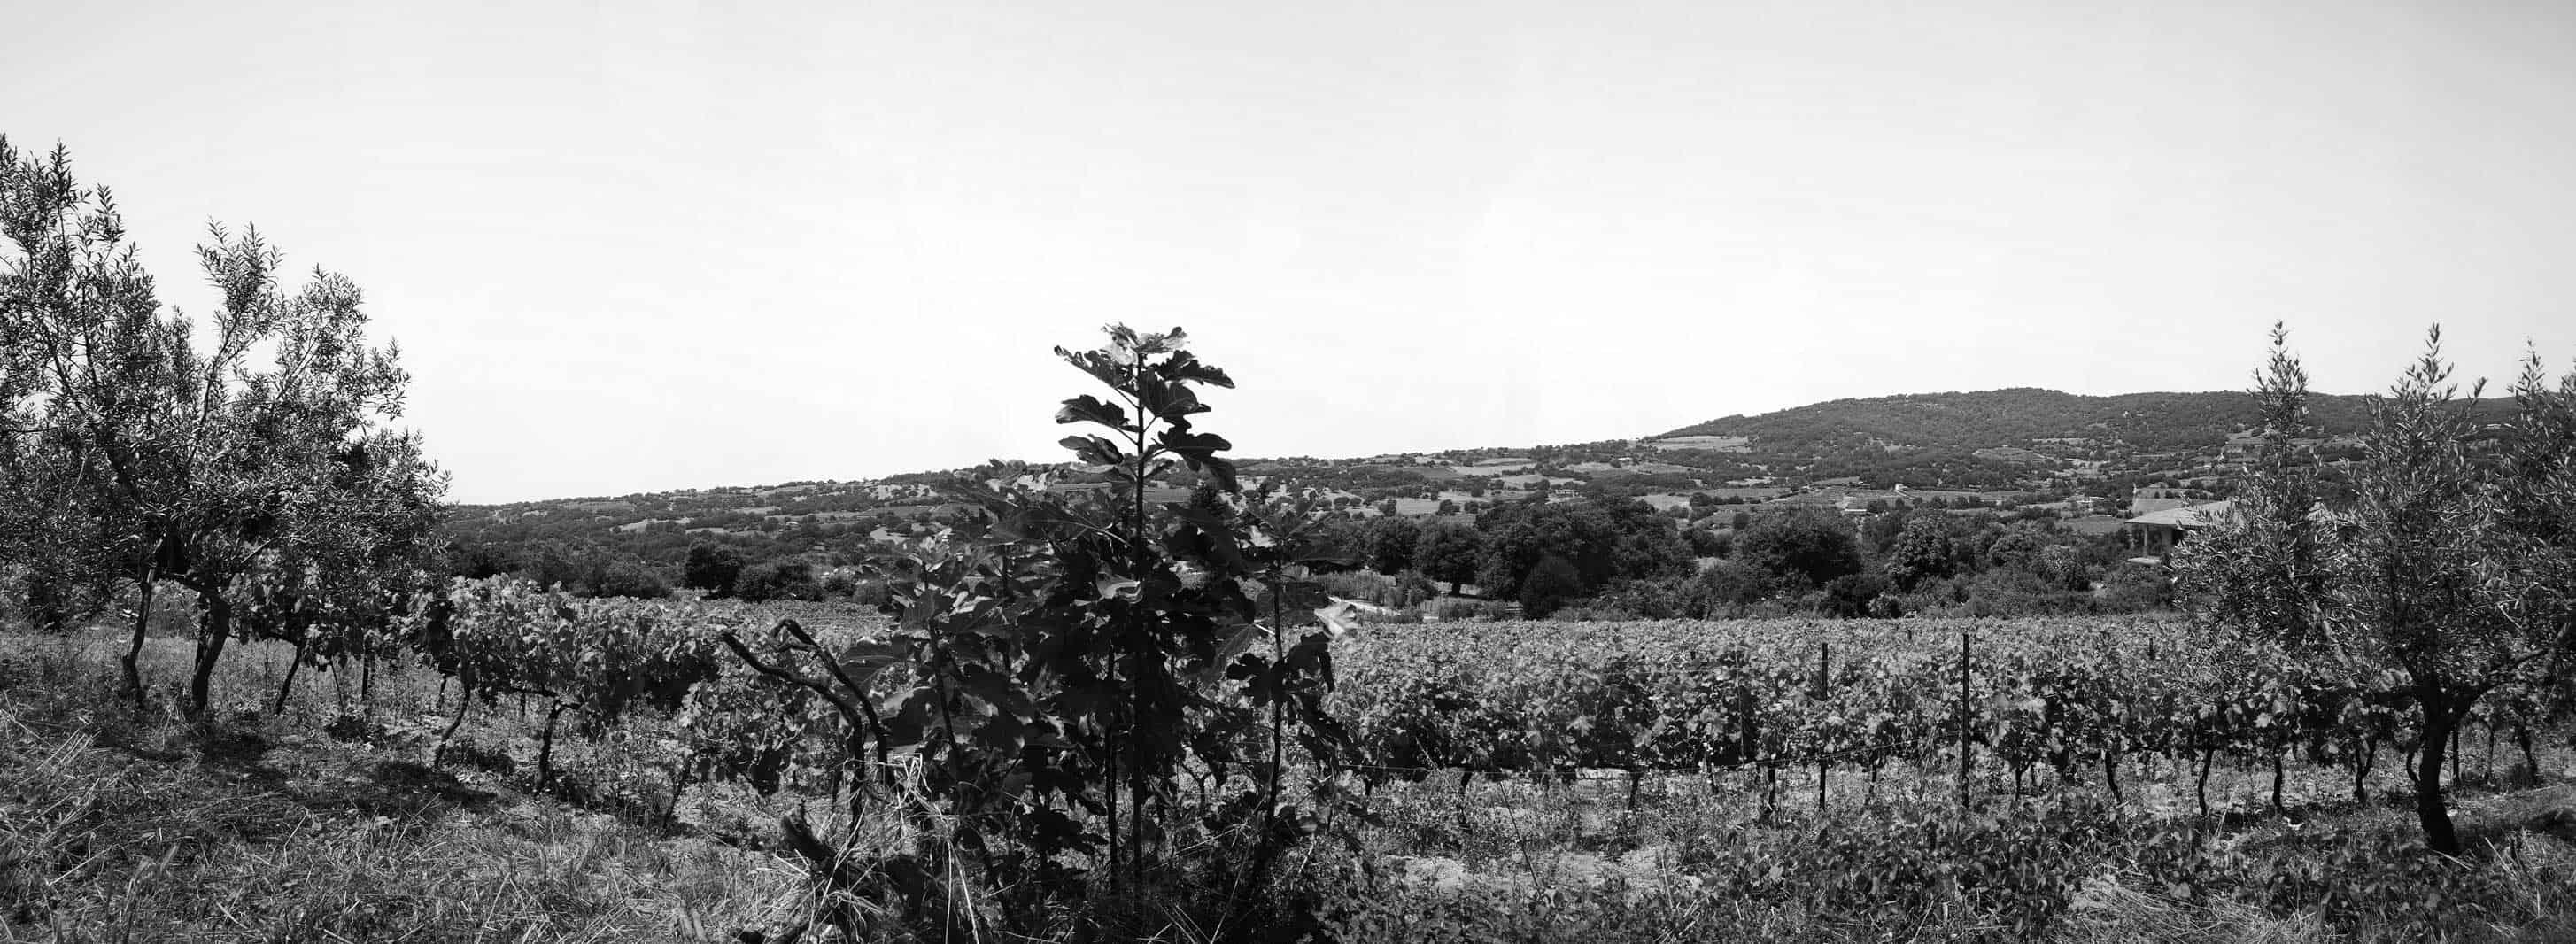 Vigneti a Sorgono, in Sardegna - Cantina del Mandrolisai